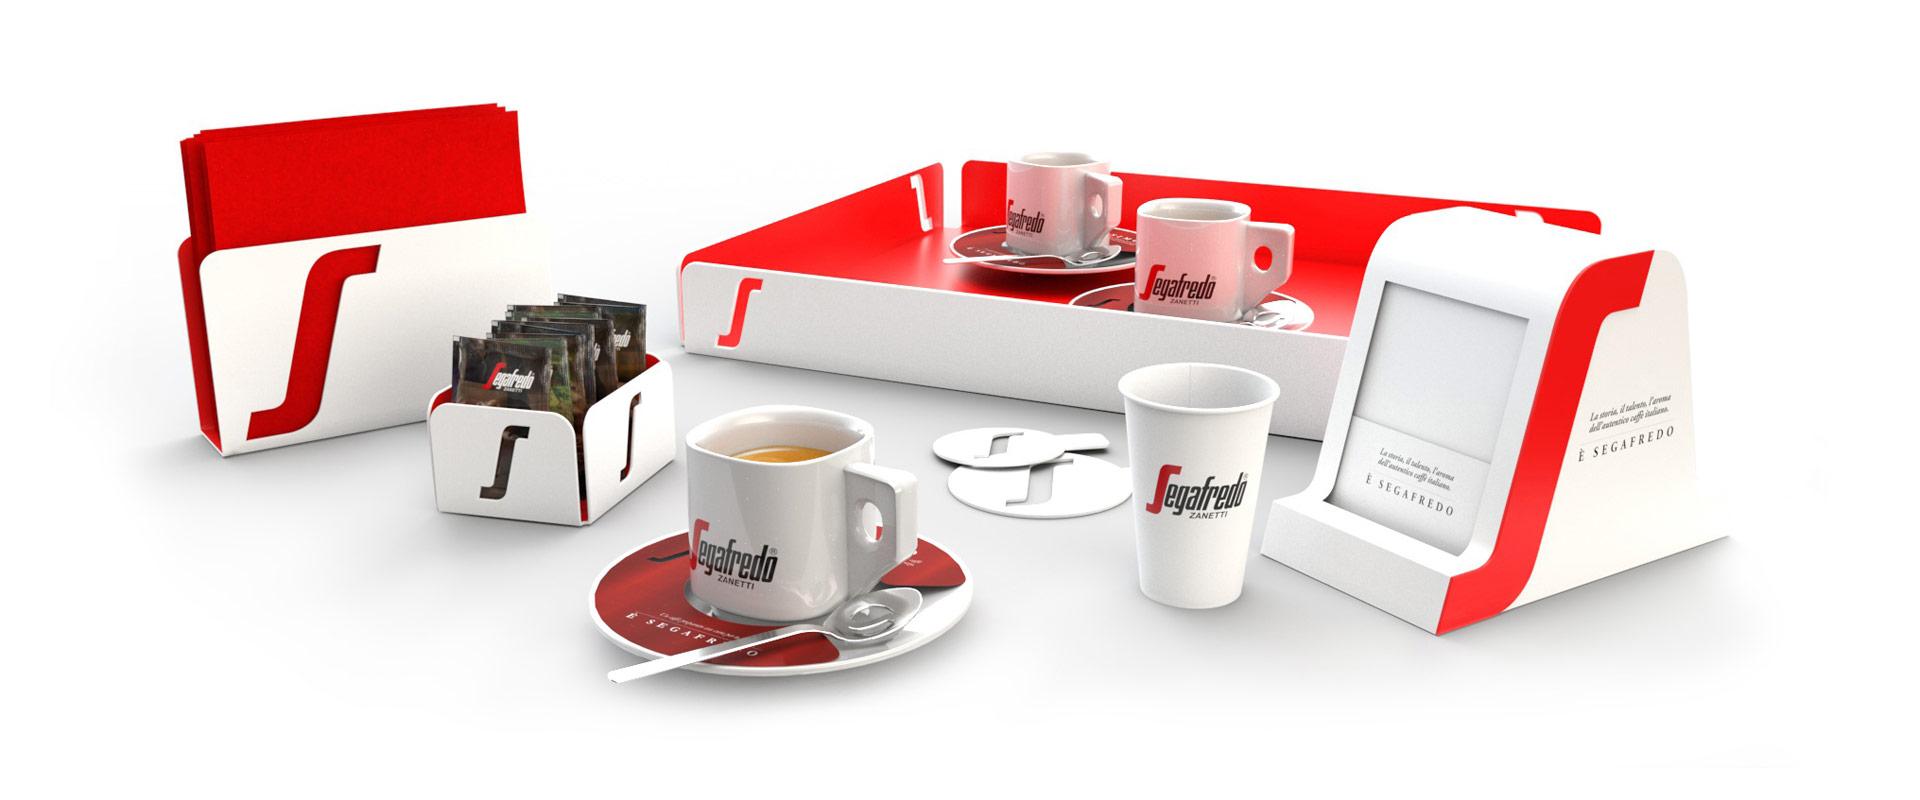 segafredo accessories bar channel design positioning